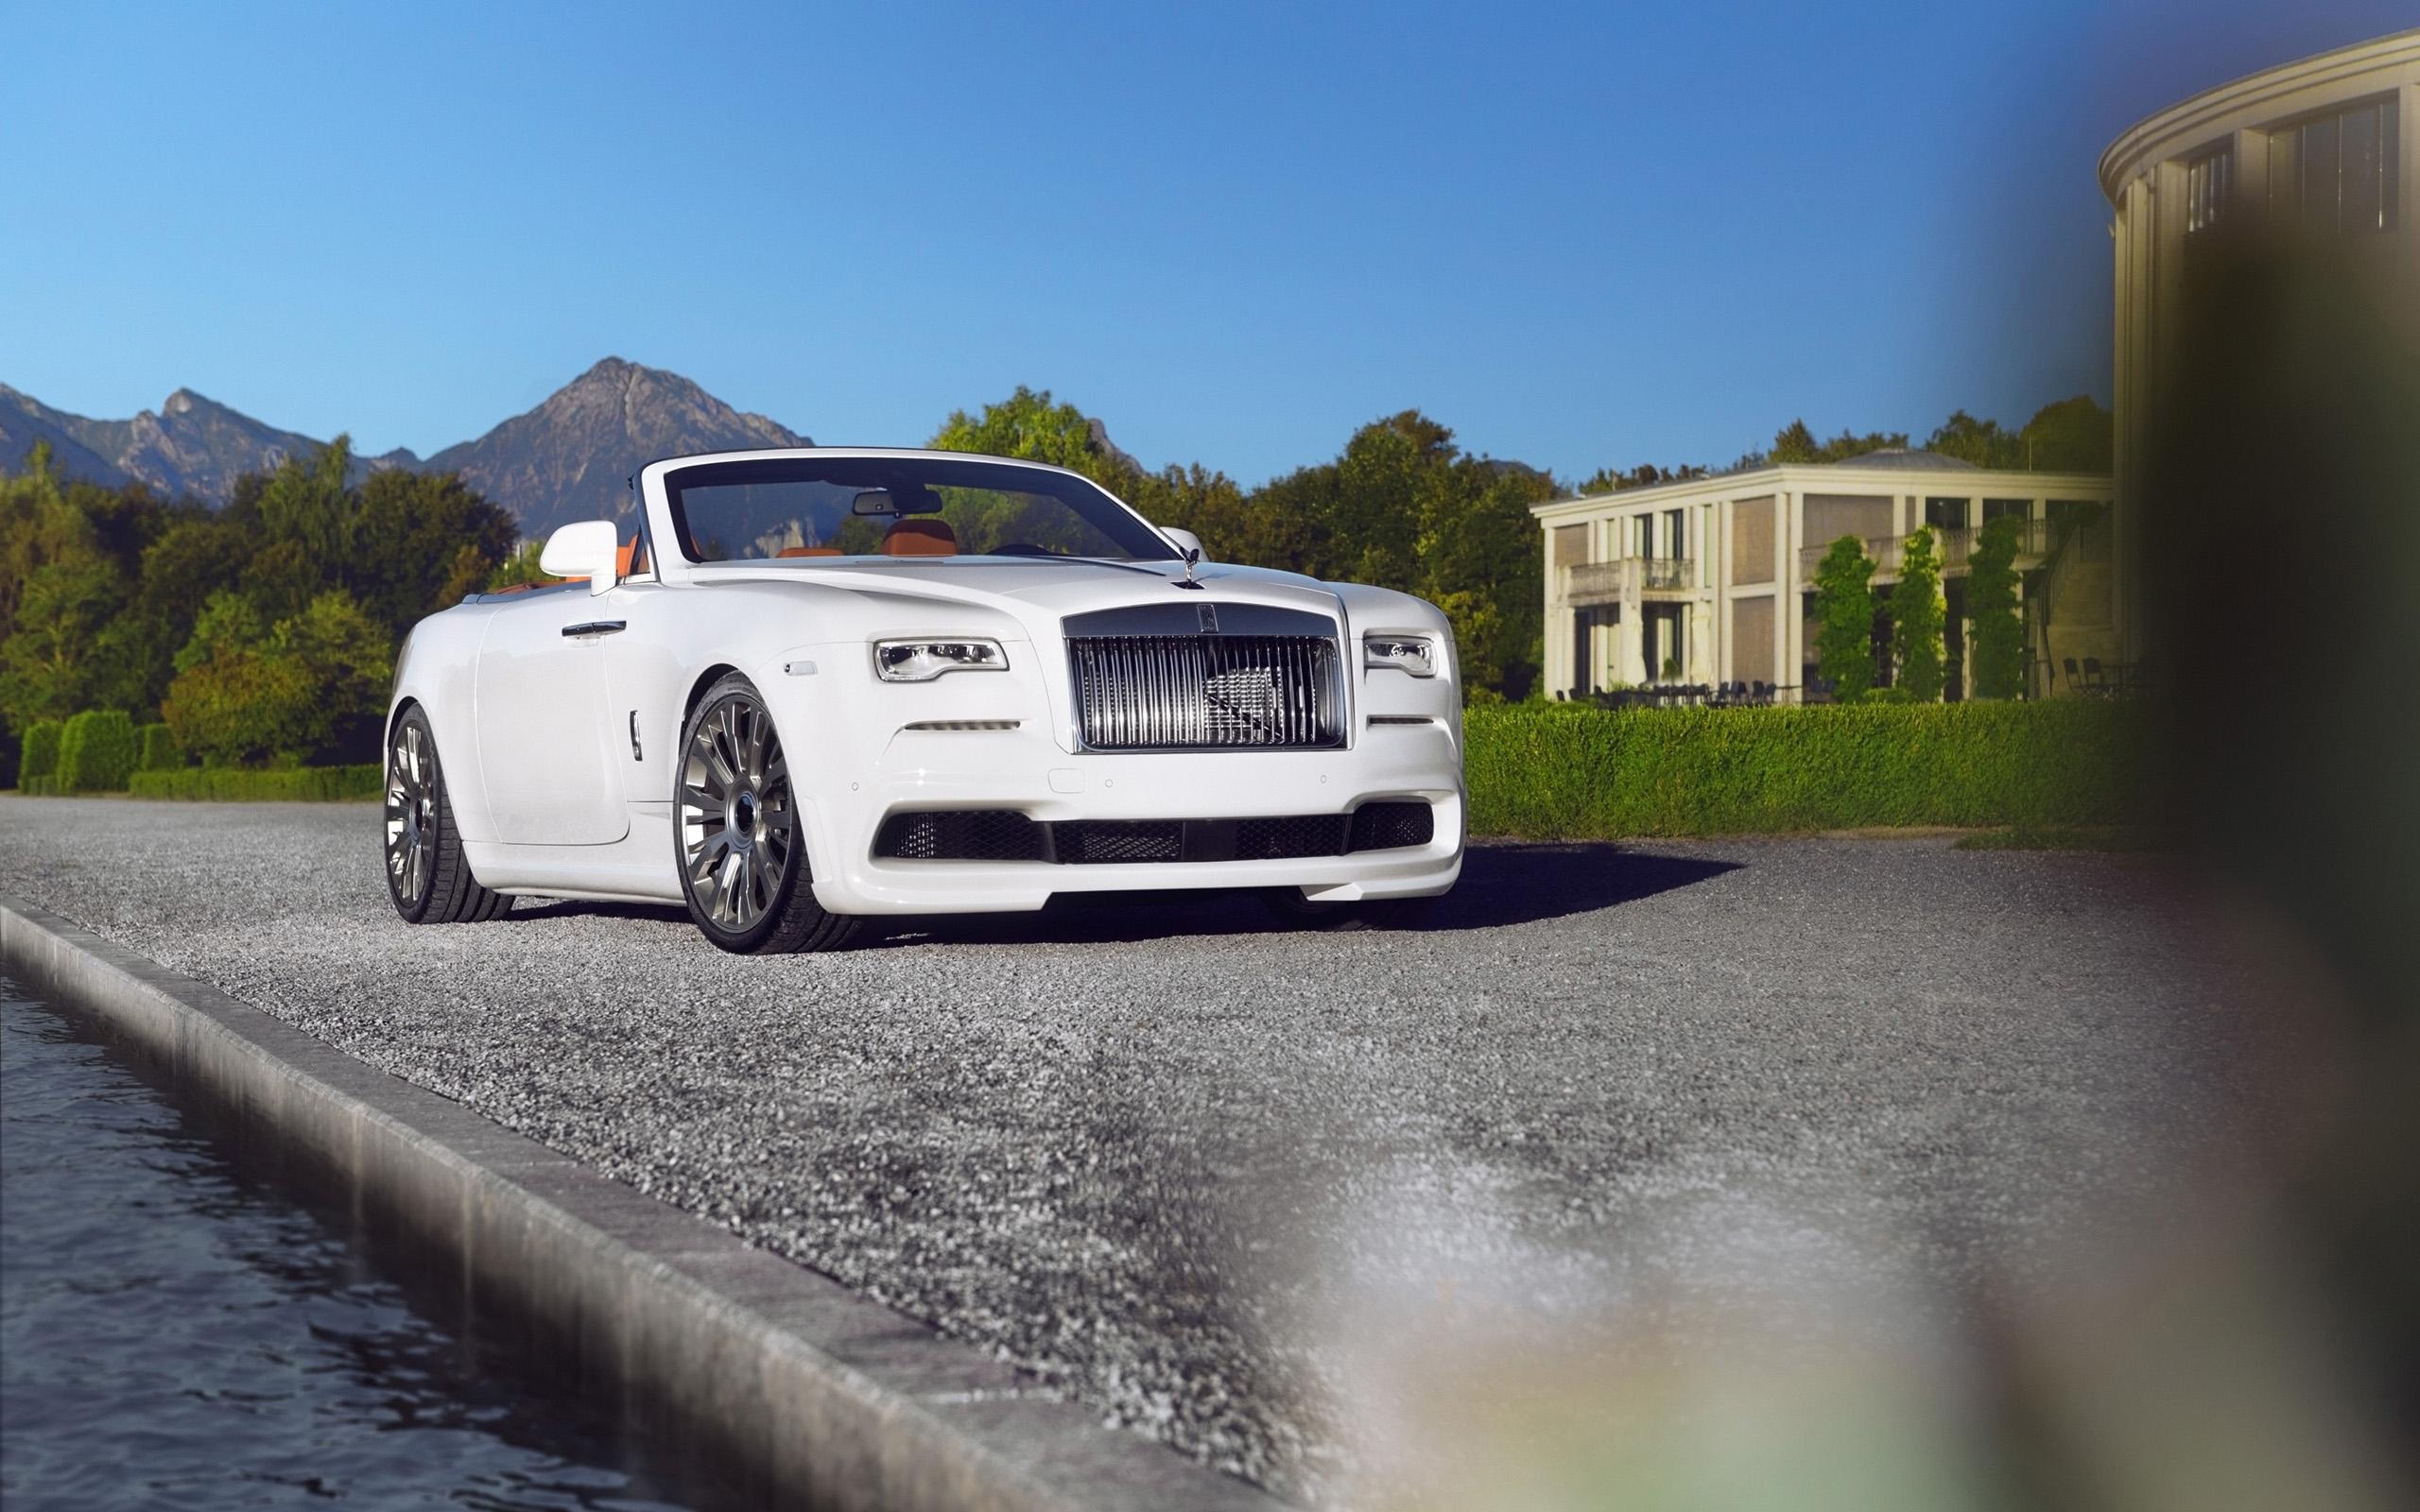 2016 Spofec Rolls Royce Dawn 4 Wallpaper Hd Car Wallpapers Id 6999